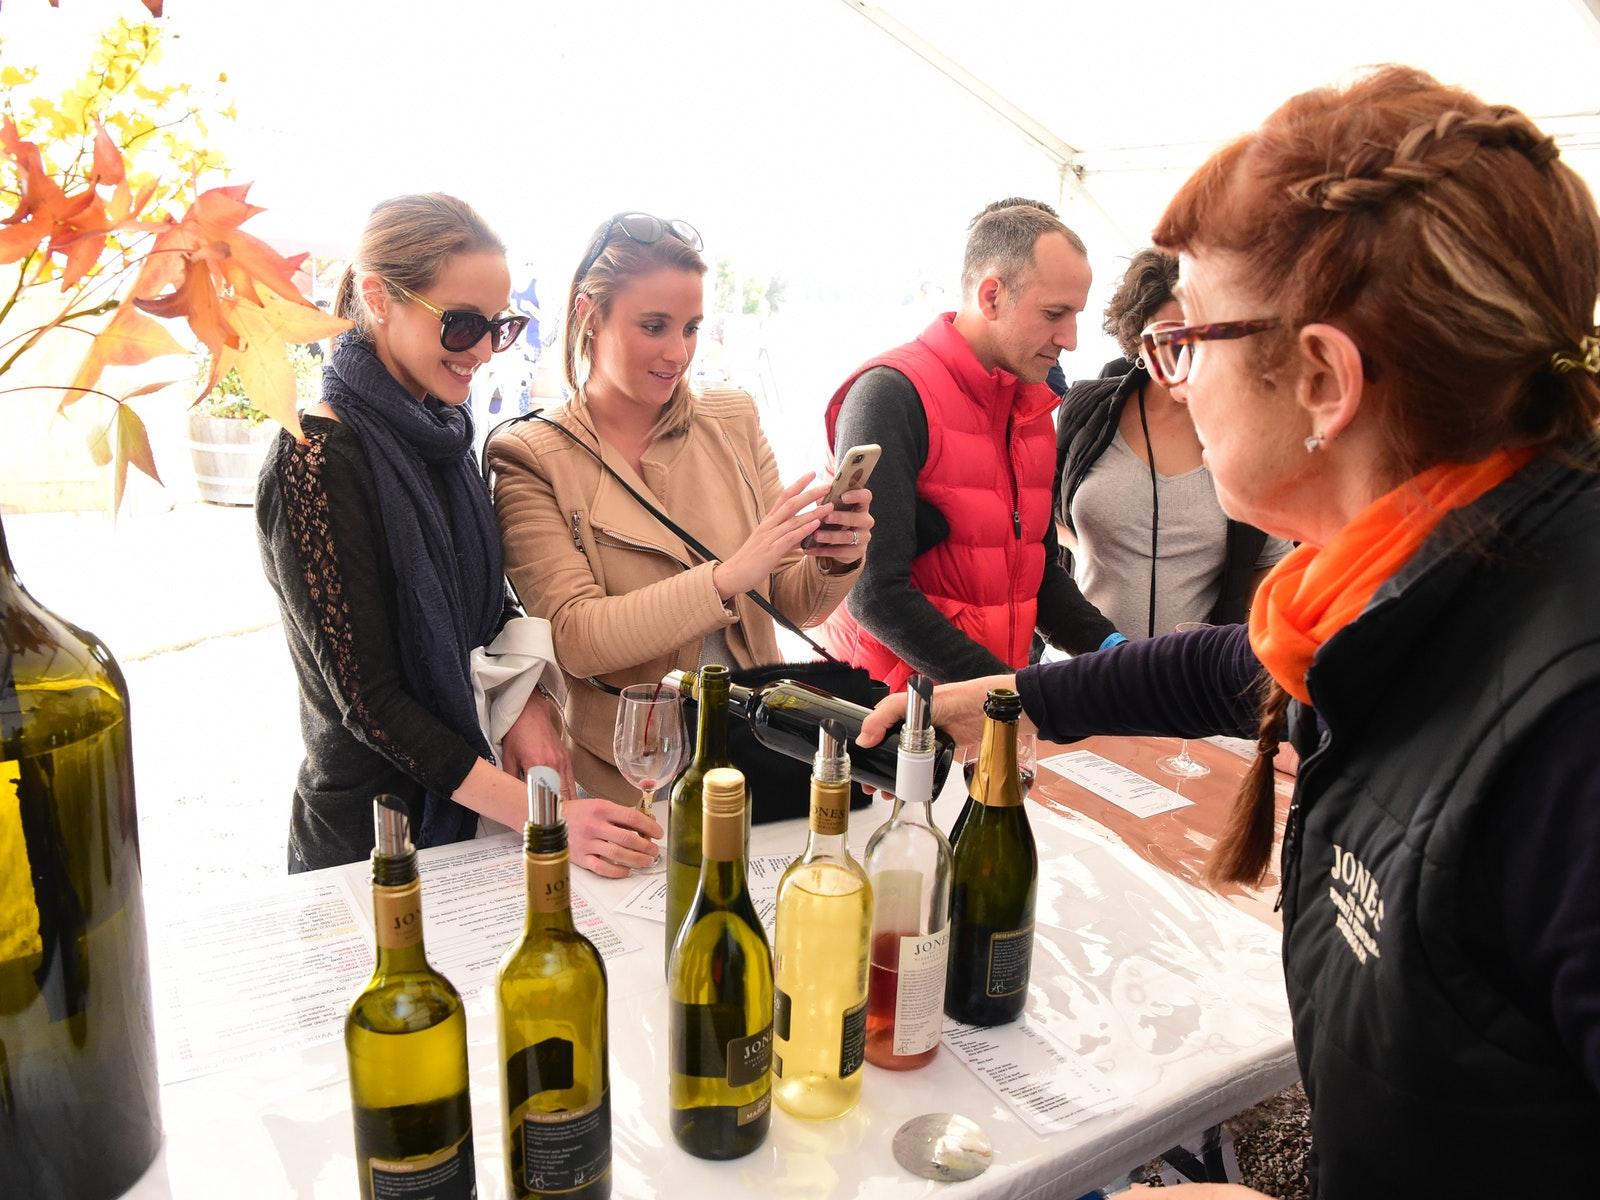 Winery Walkabout at Jones 2017